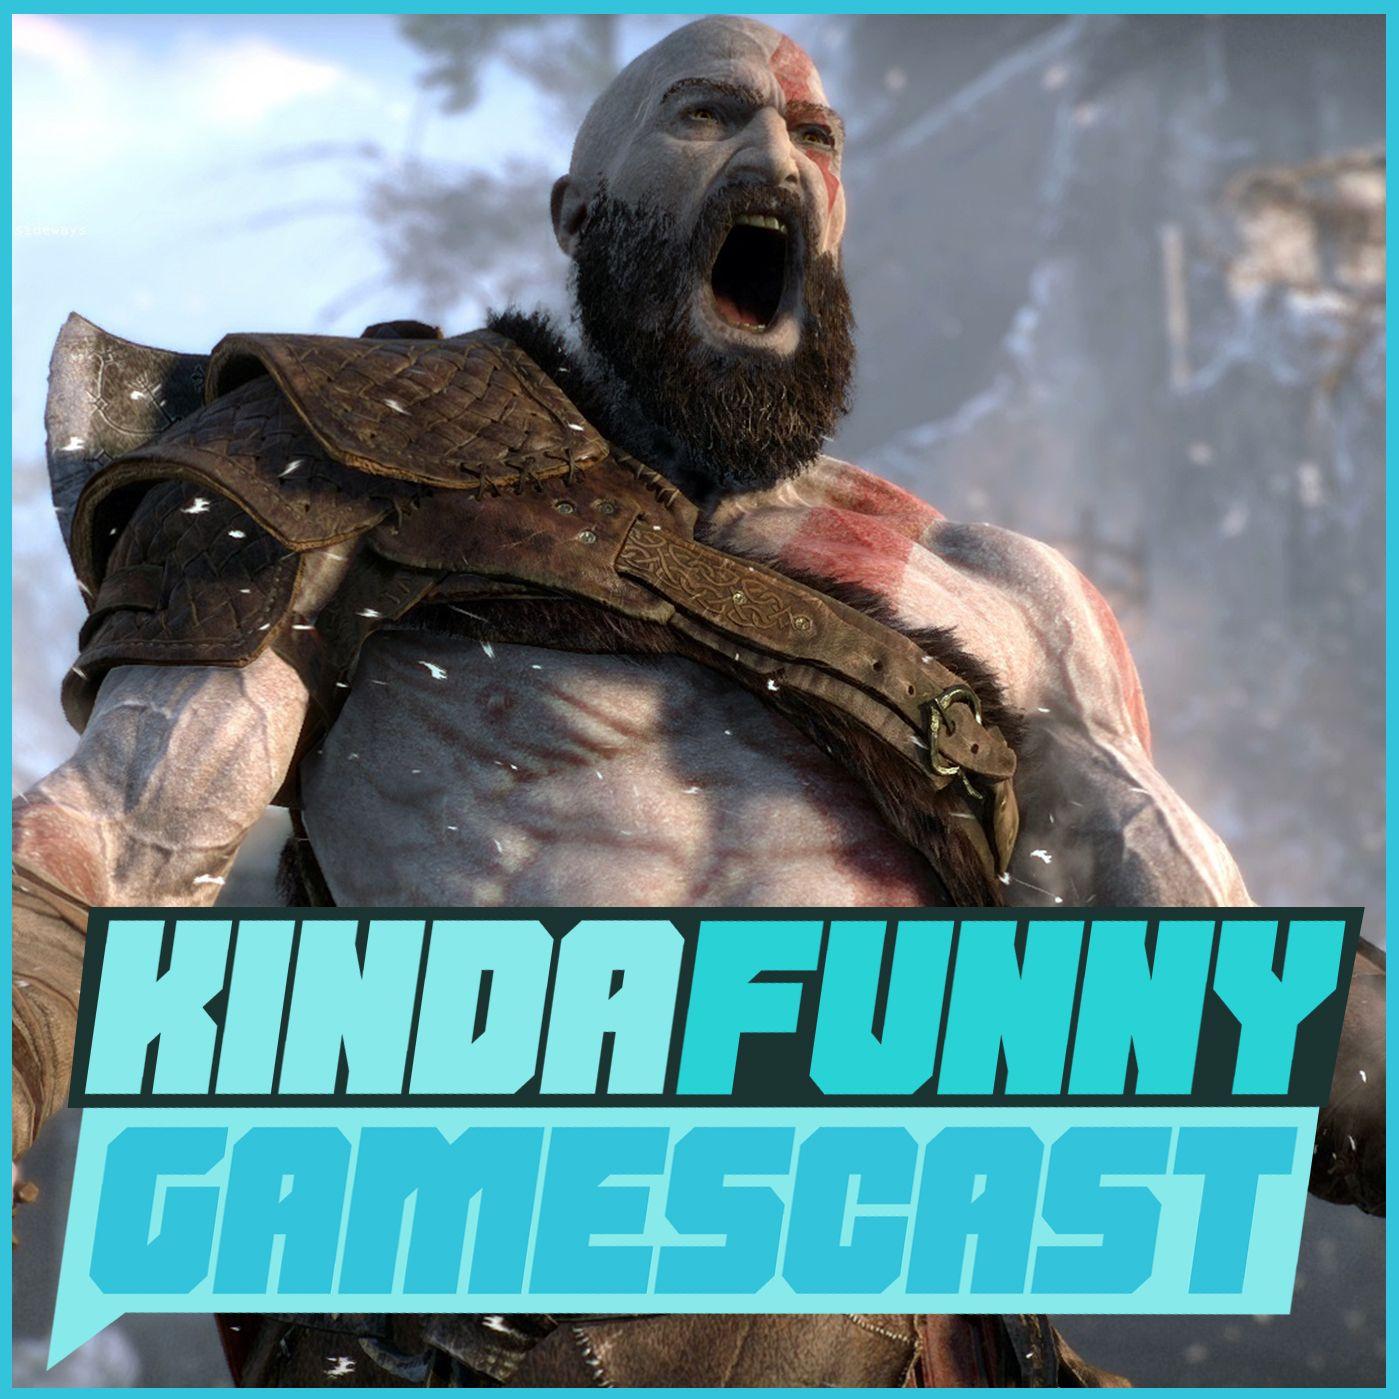 2018 Video Game Predictions - Kinda Funny Gamescast Ep. 151